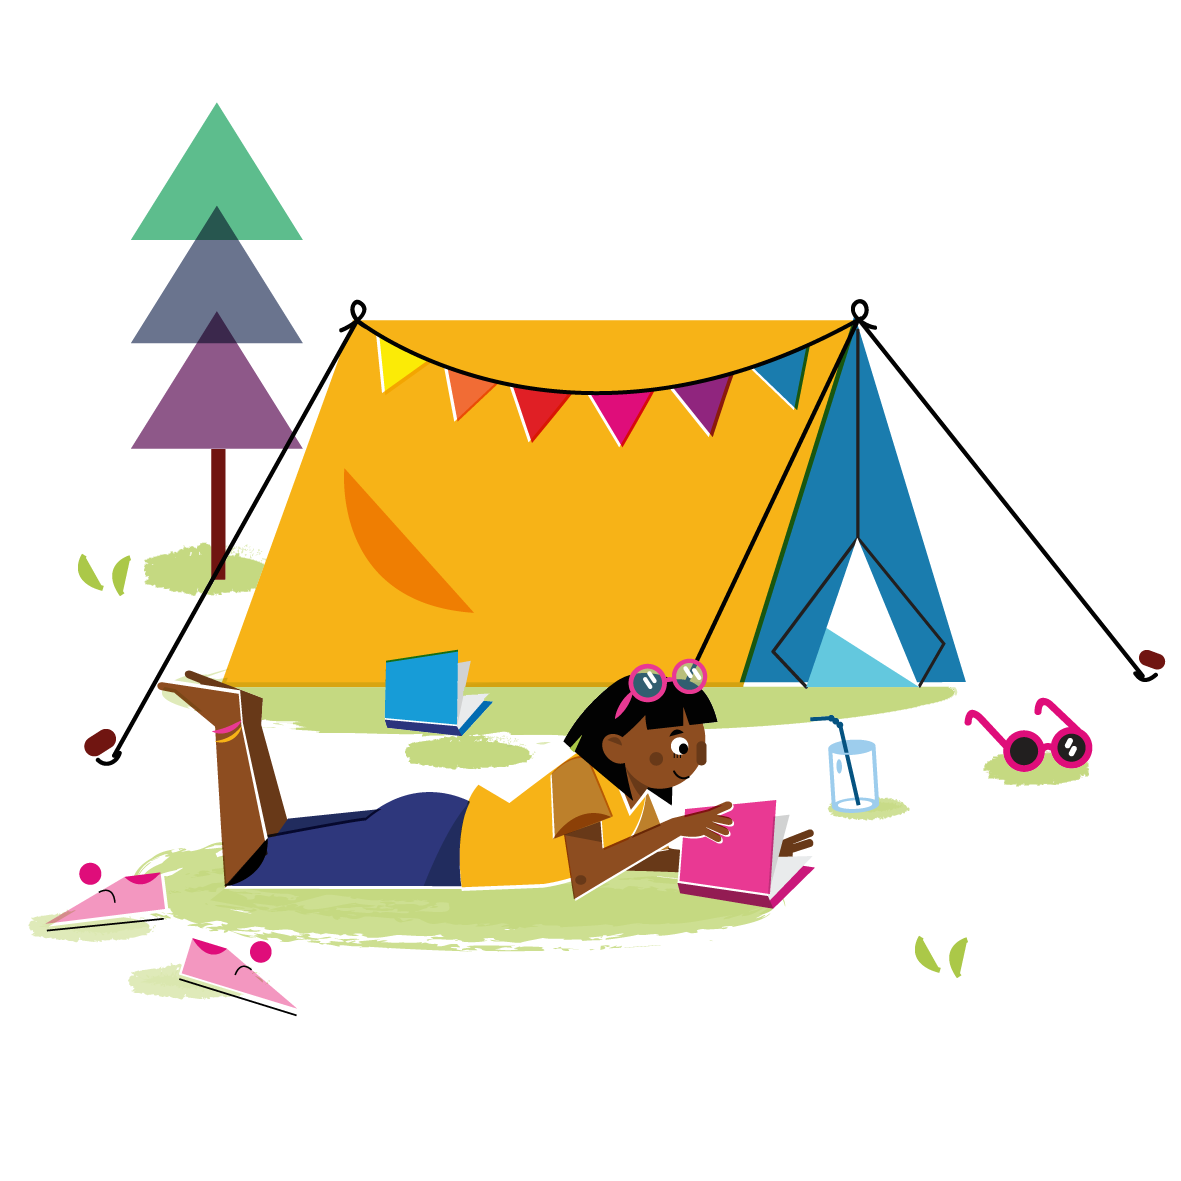 Camping girl - Vector Illustration © Emeline Barrea, All rights reserved